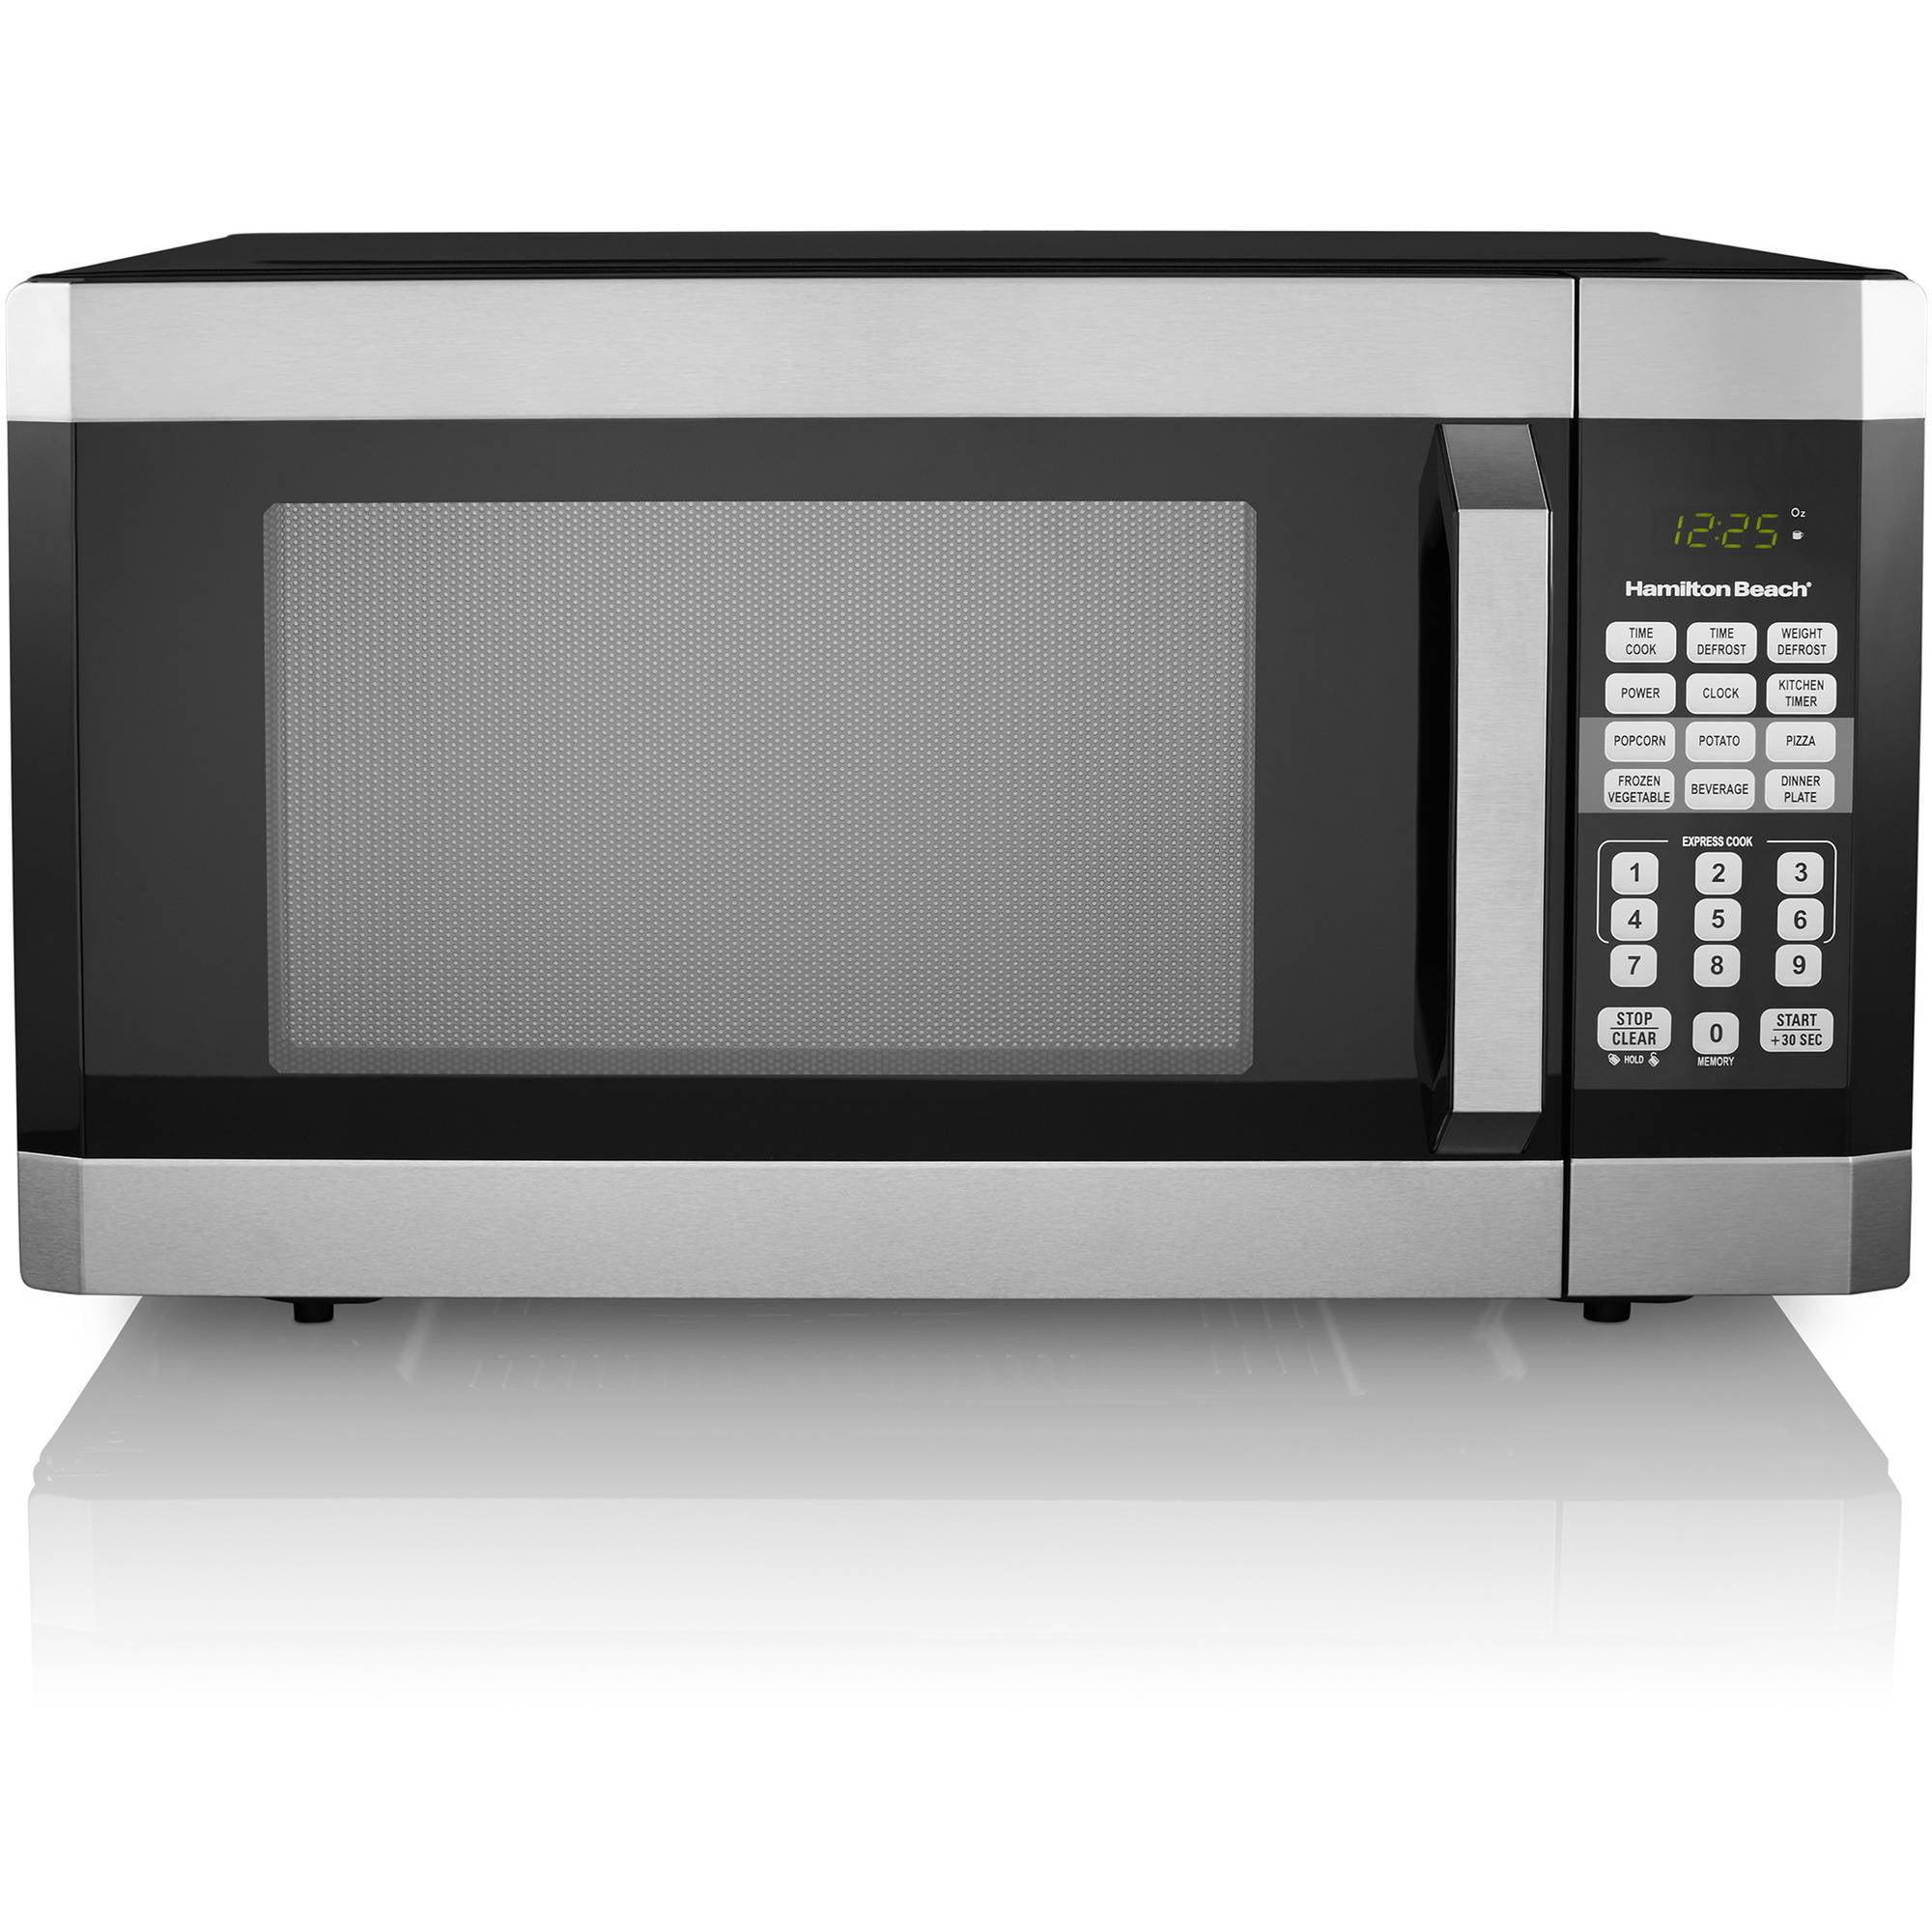 Microwave Oven Stainless Steel ~ Hamilton beach cu ft digital microwave oven stainless